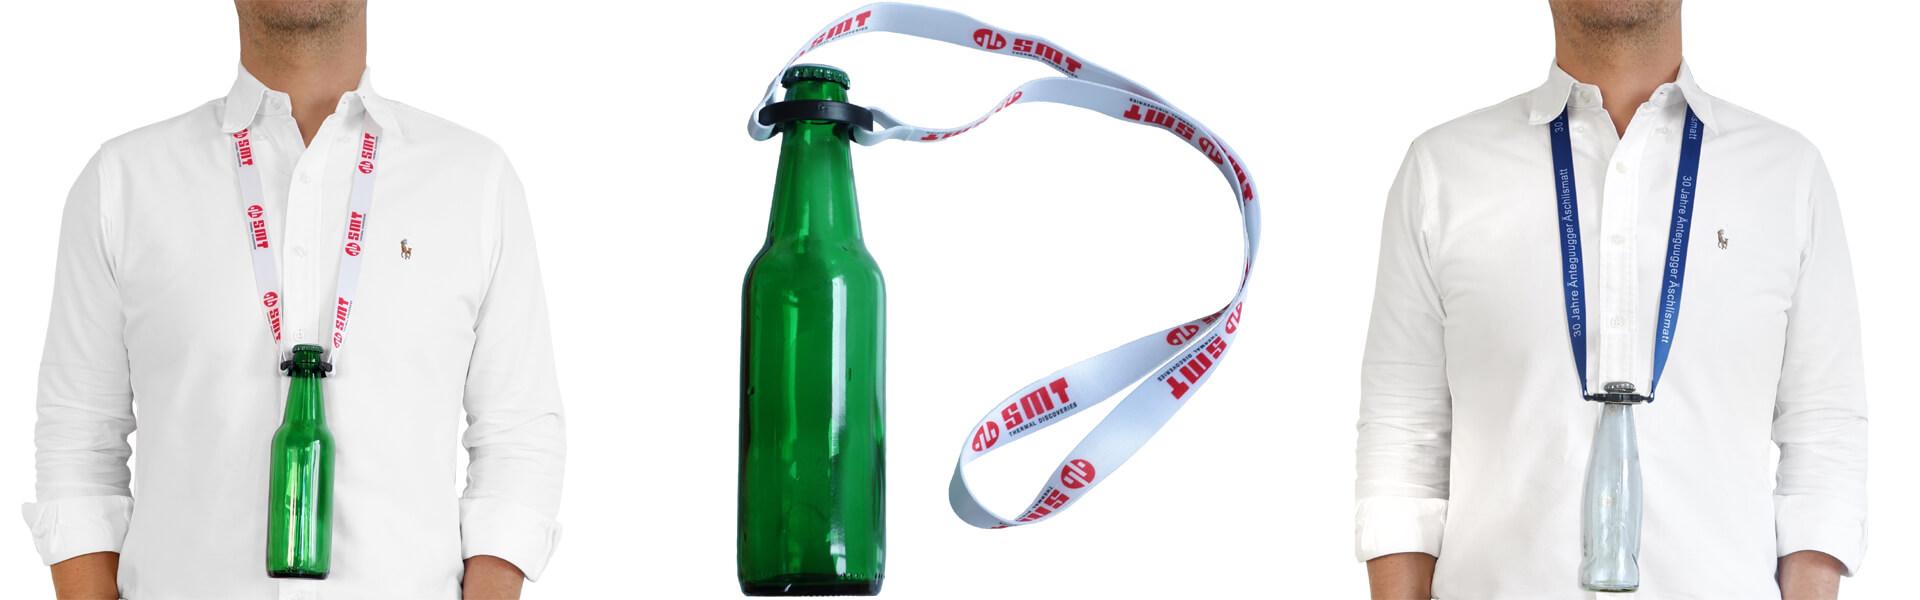 lanyards with bottle holder